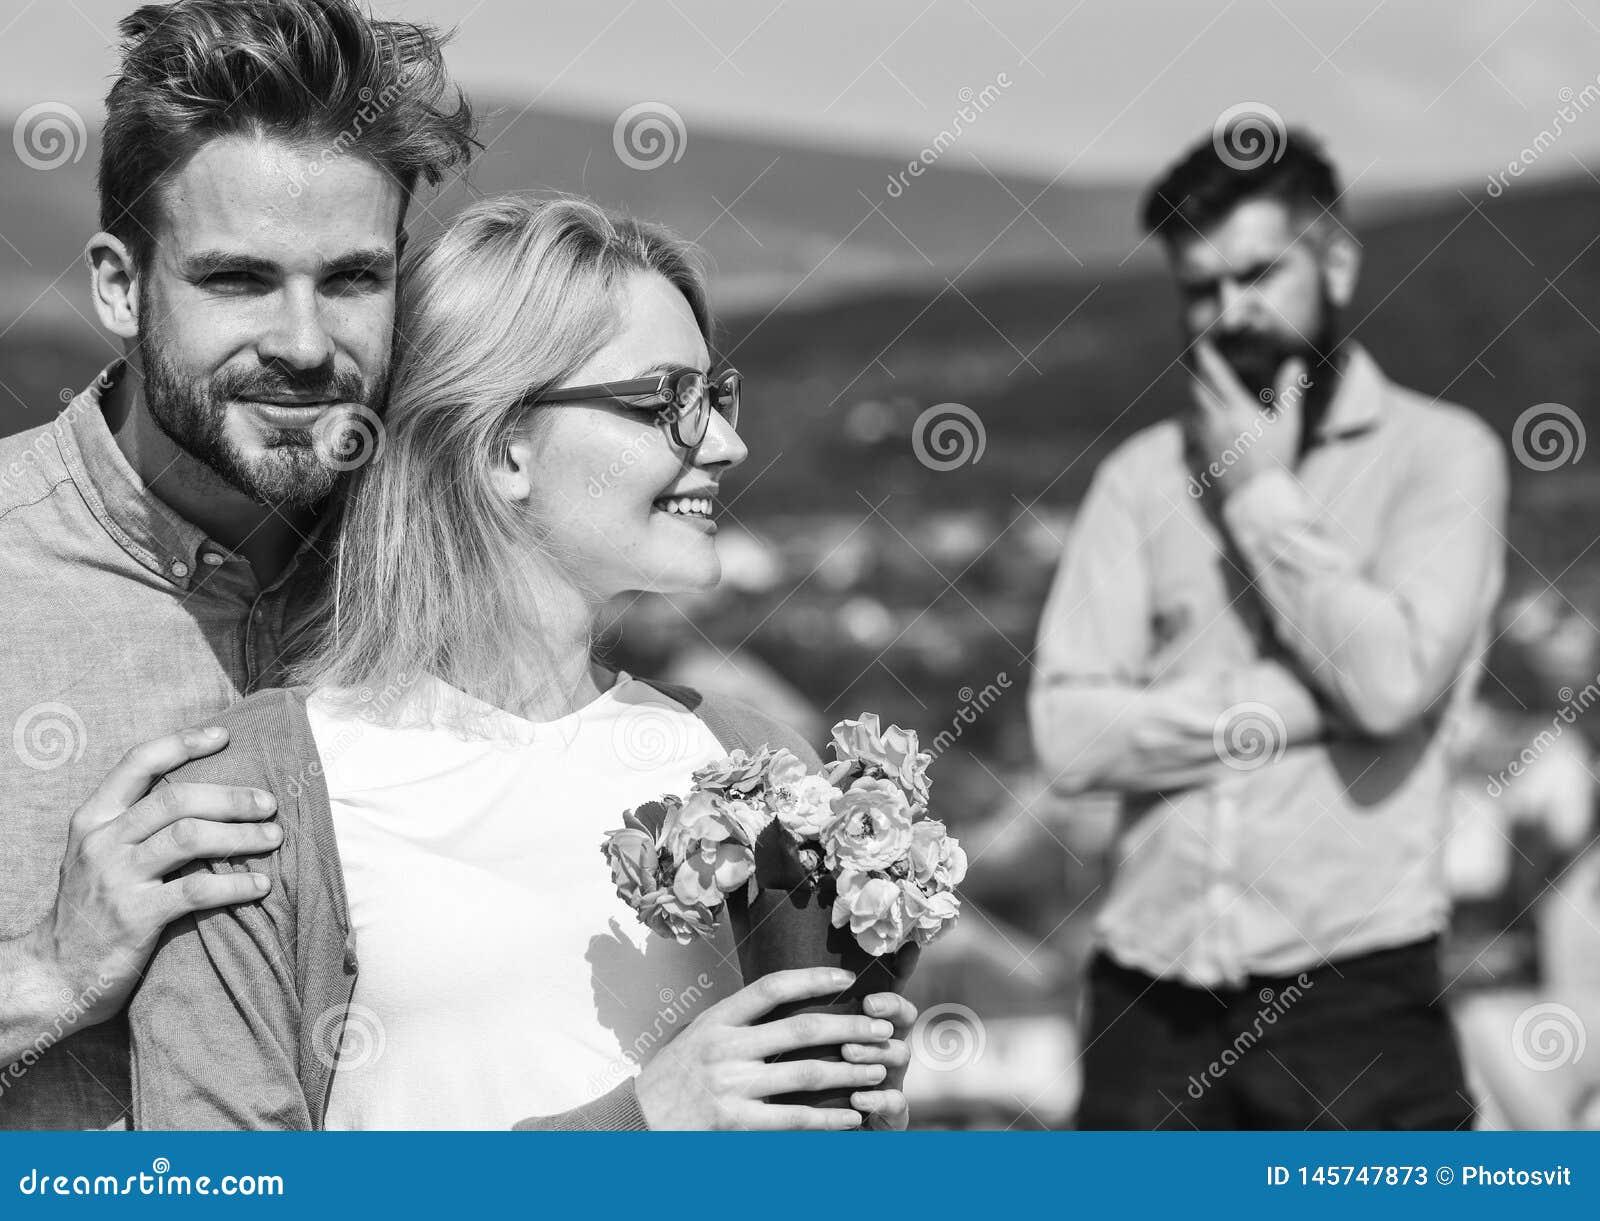 Lovers Hugs Outdoor Flirt Romance Relations  Couple Romantic